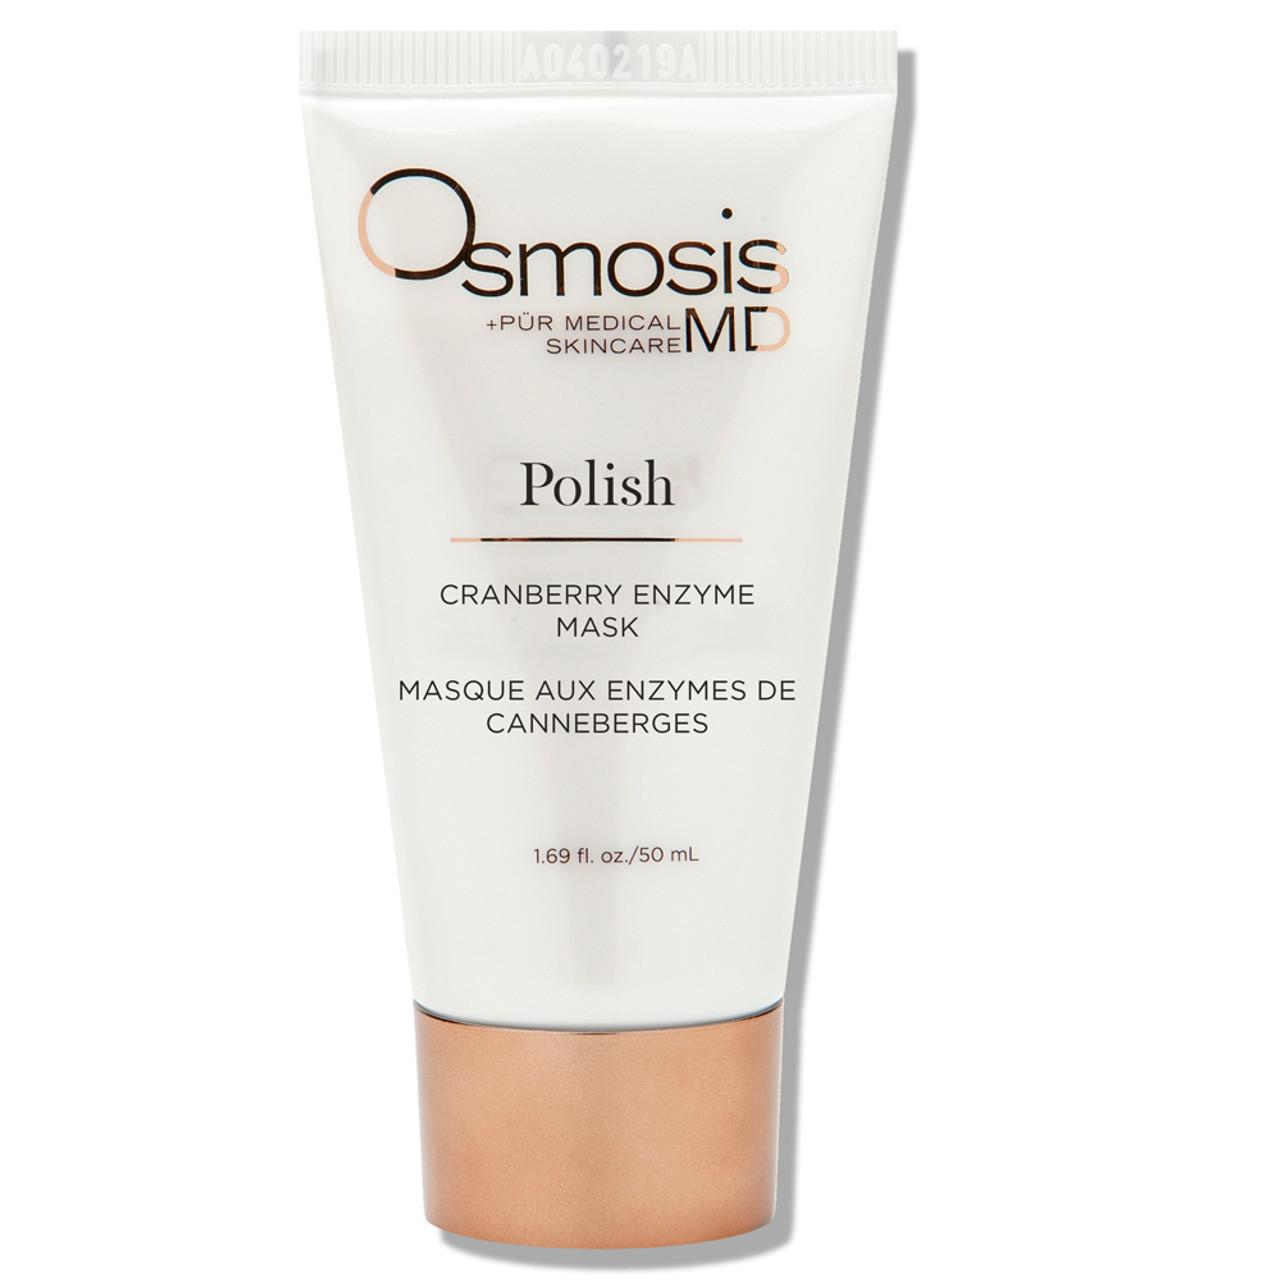 Osmosis +Skincare MD Polish - Cranberry Enzyme Mask BeautifiedYou.com